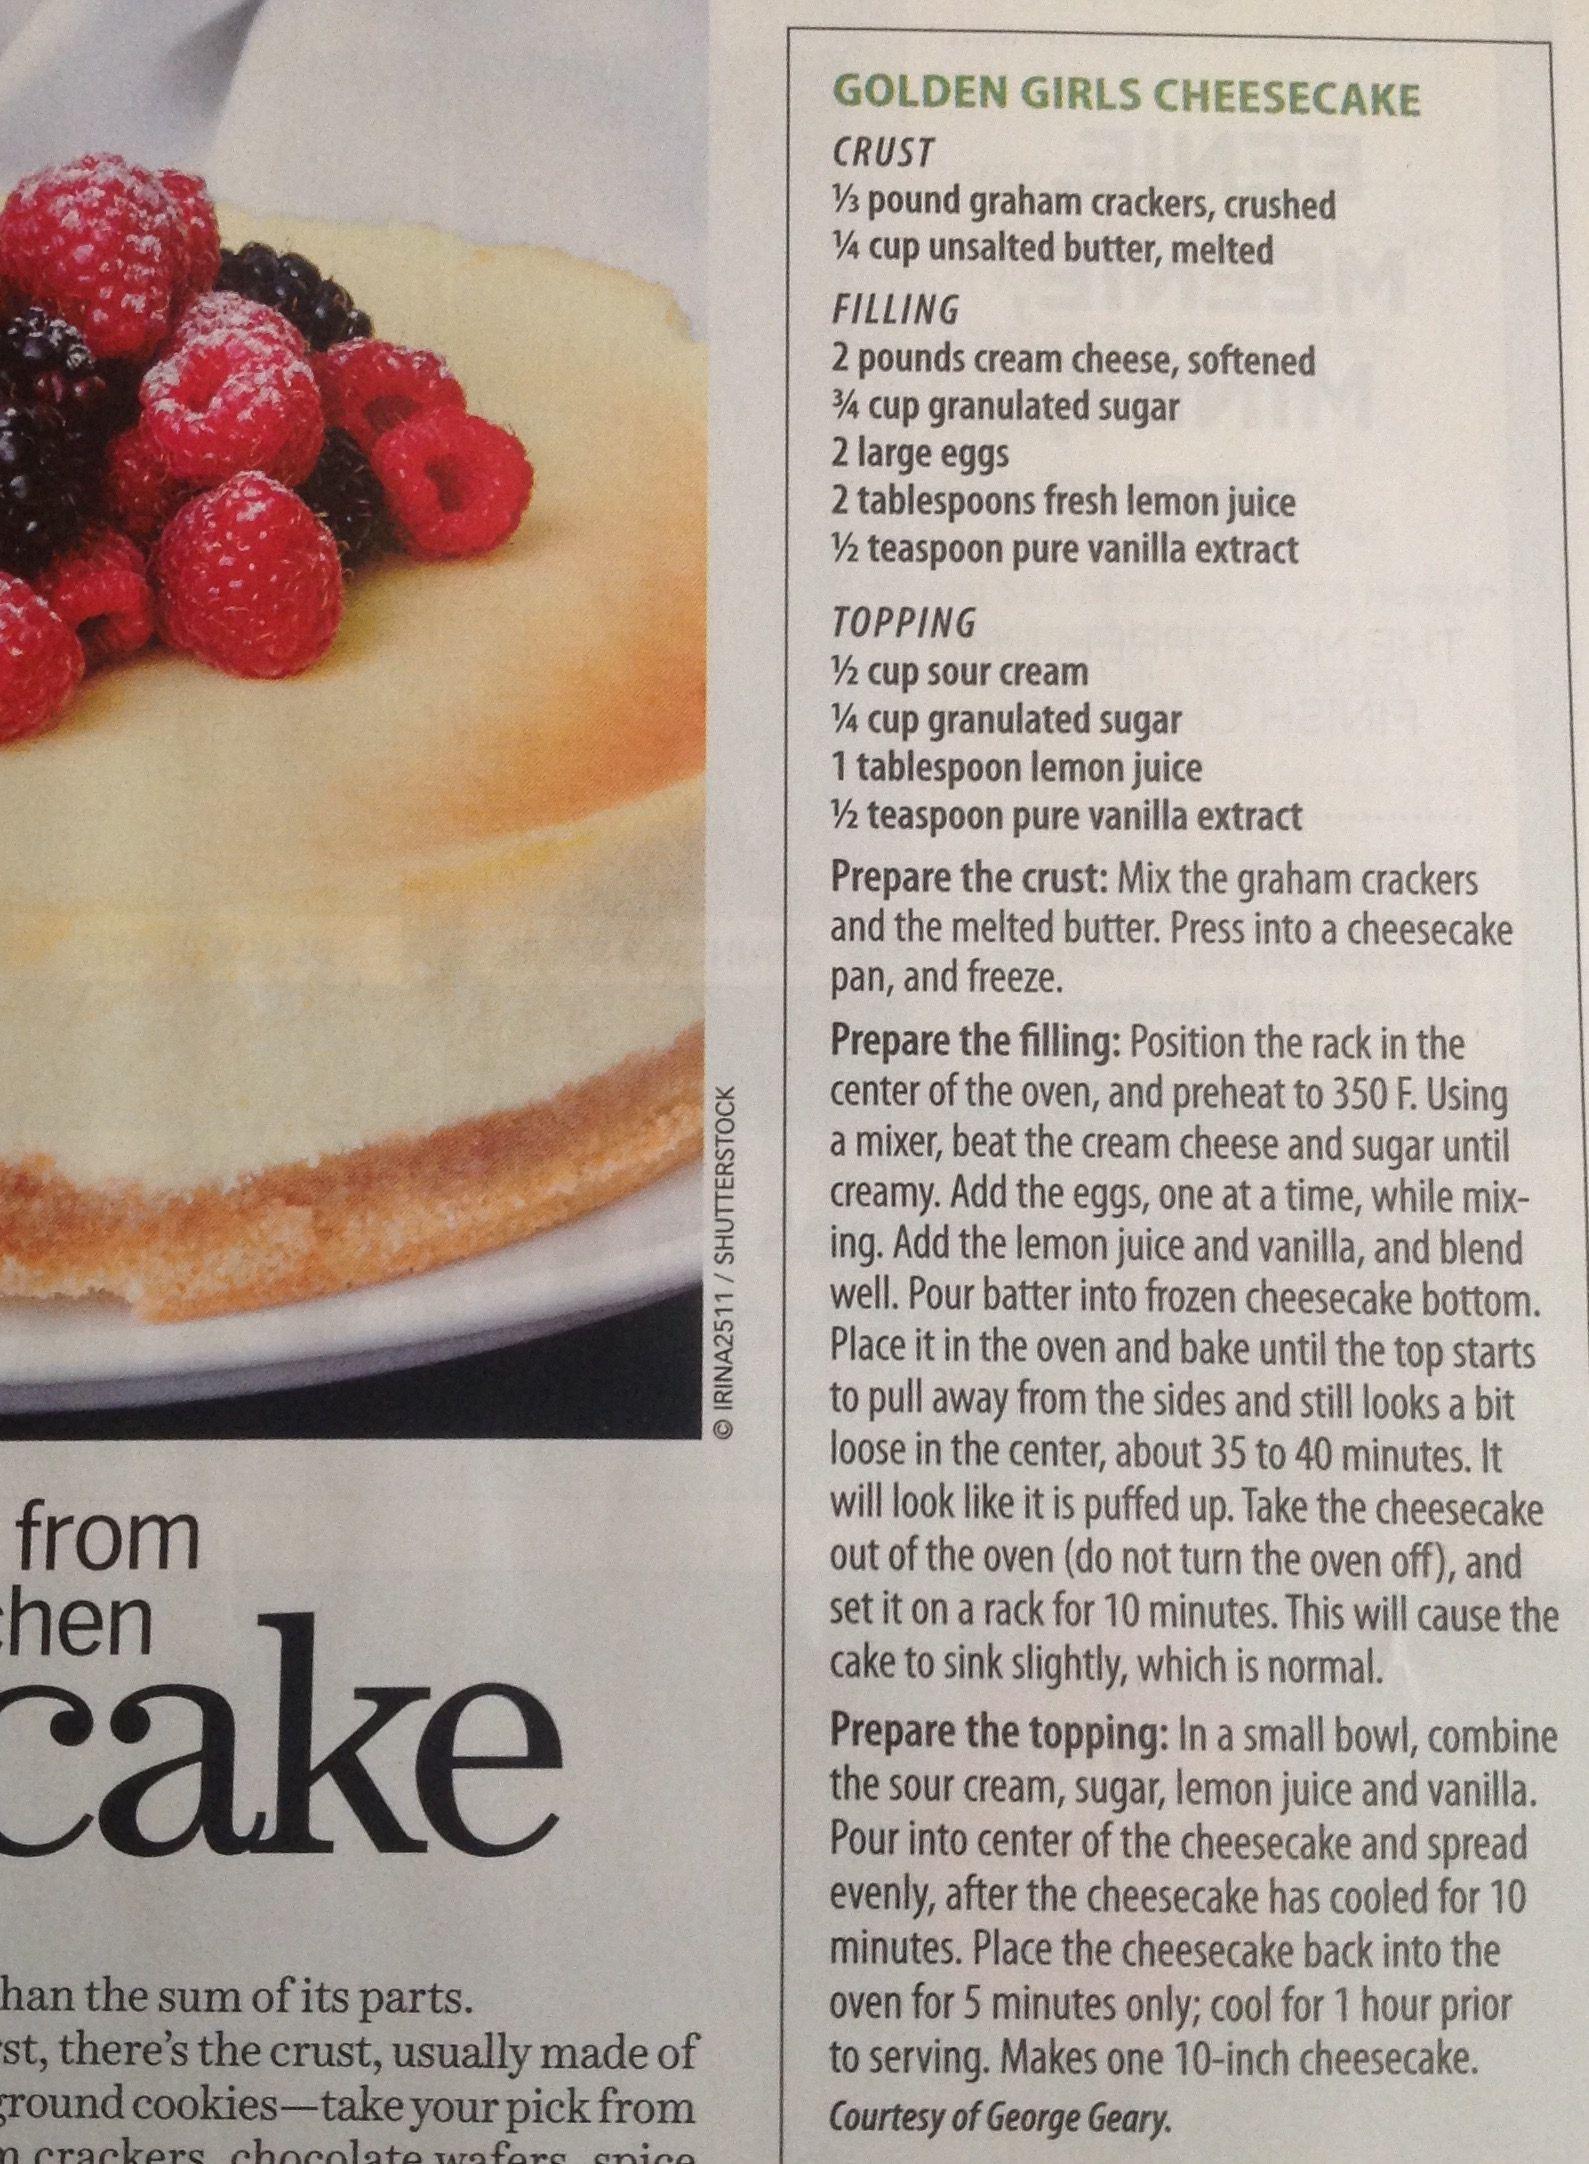 Golden Girls Cheesecake From Costco Magazine May 2018 Costco Cheesecake Recipe Sour Cream Cheesecake Dessert Recipes